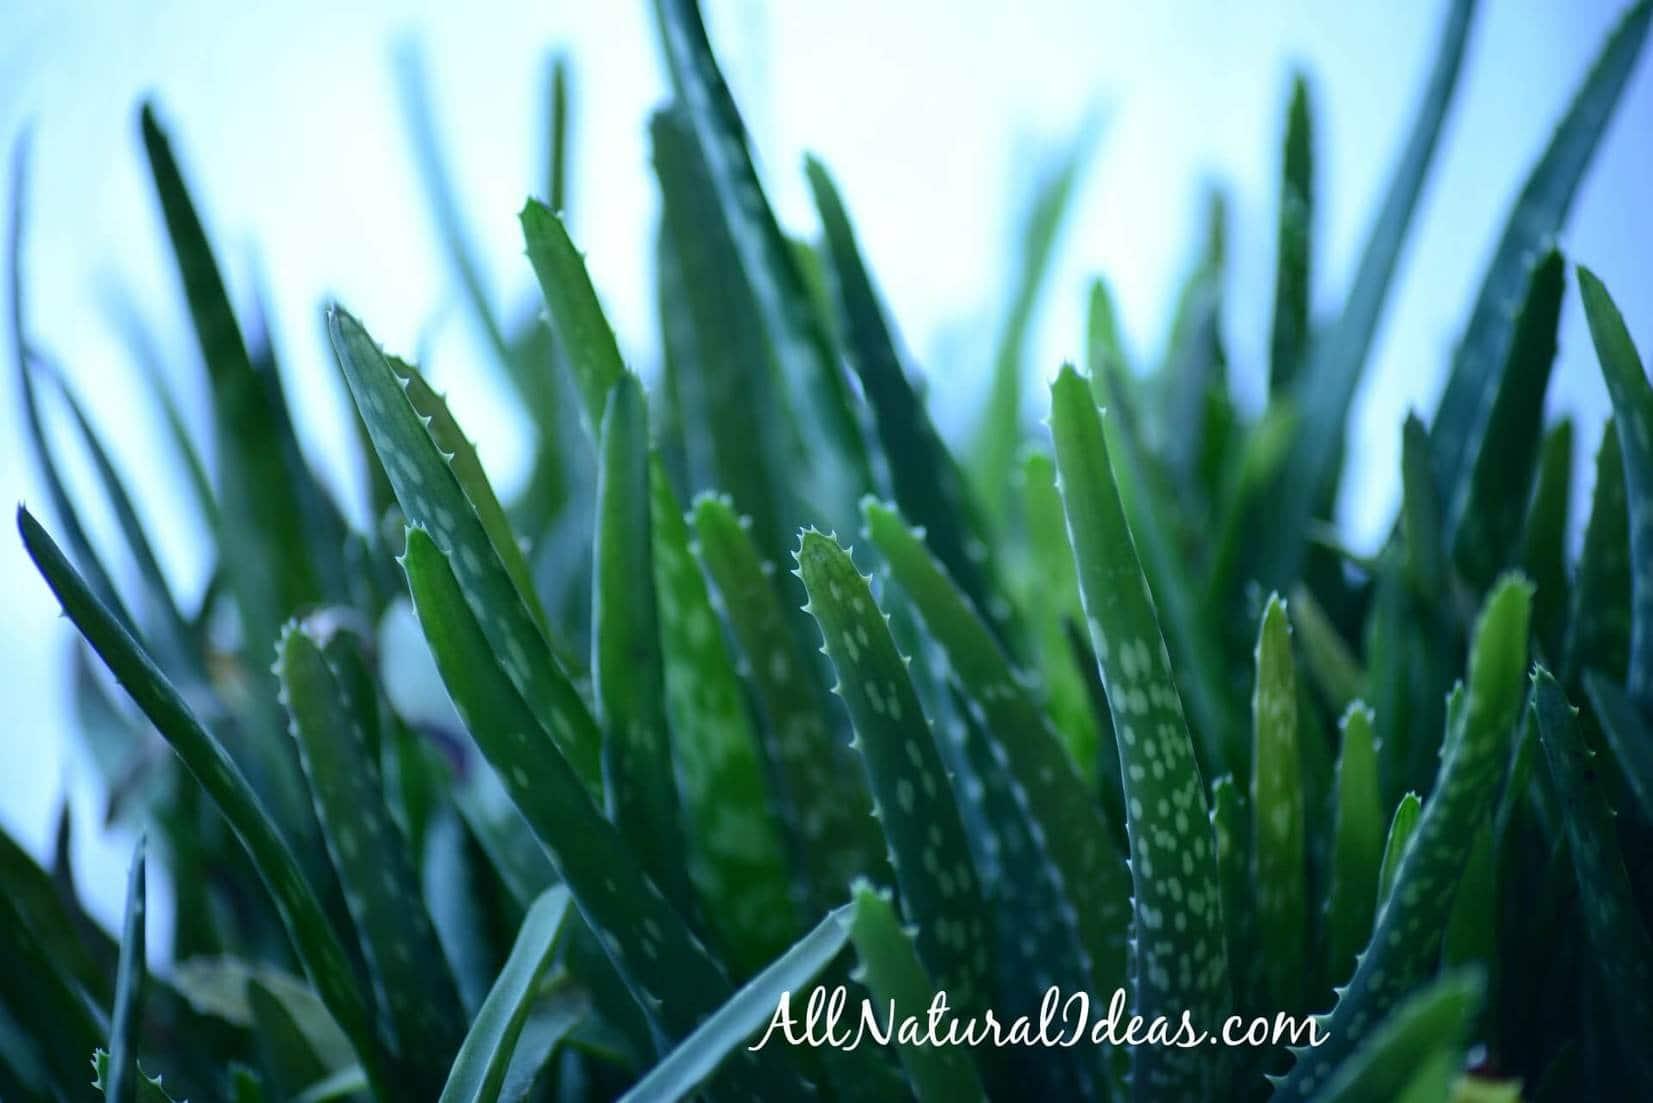 Aloe vera internal use benefits